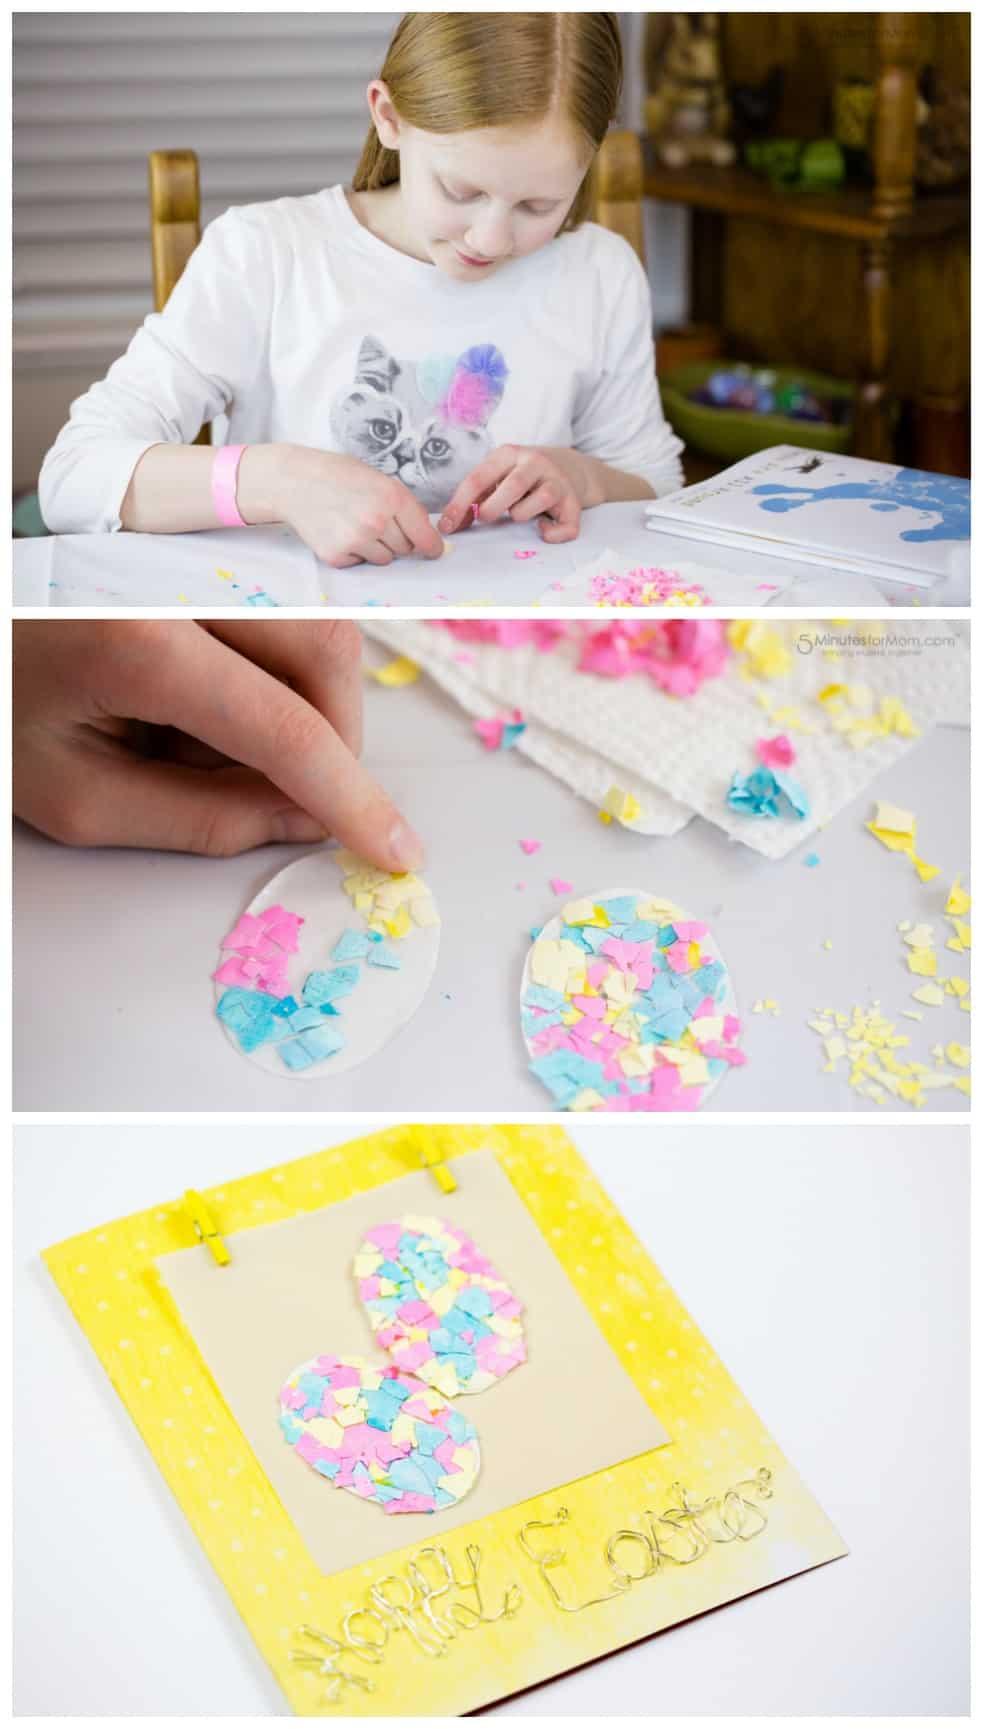 How to Make Eggshell Mosaics